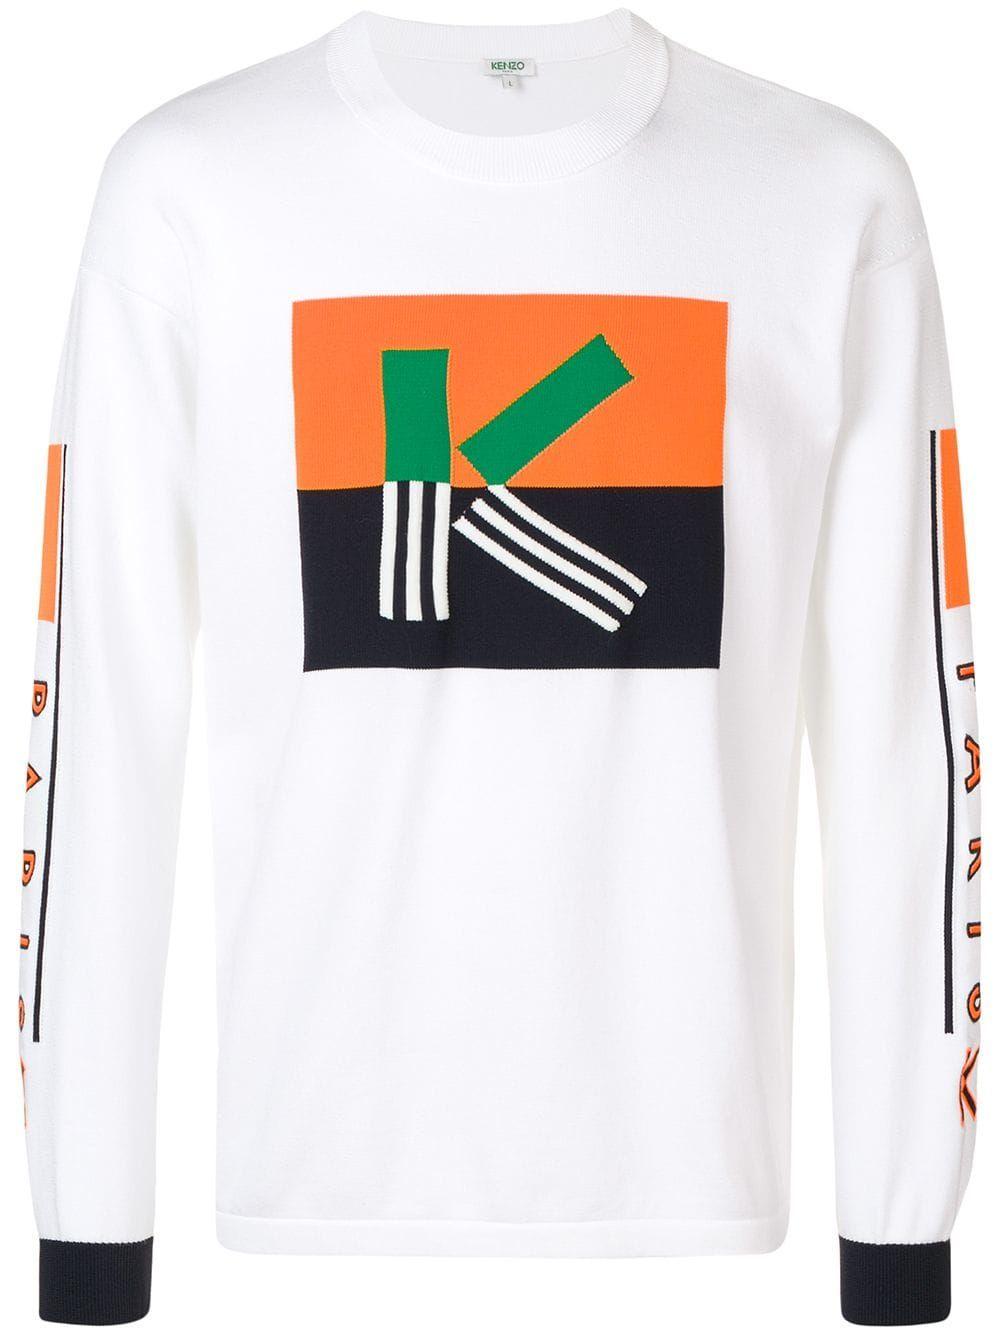 Kenzo K colour block jumper White | Kenzo, Color blocking